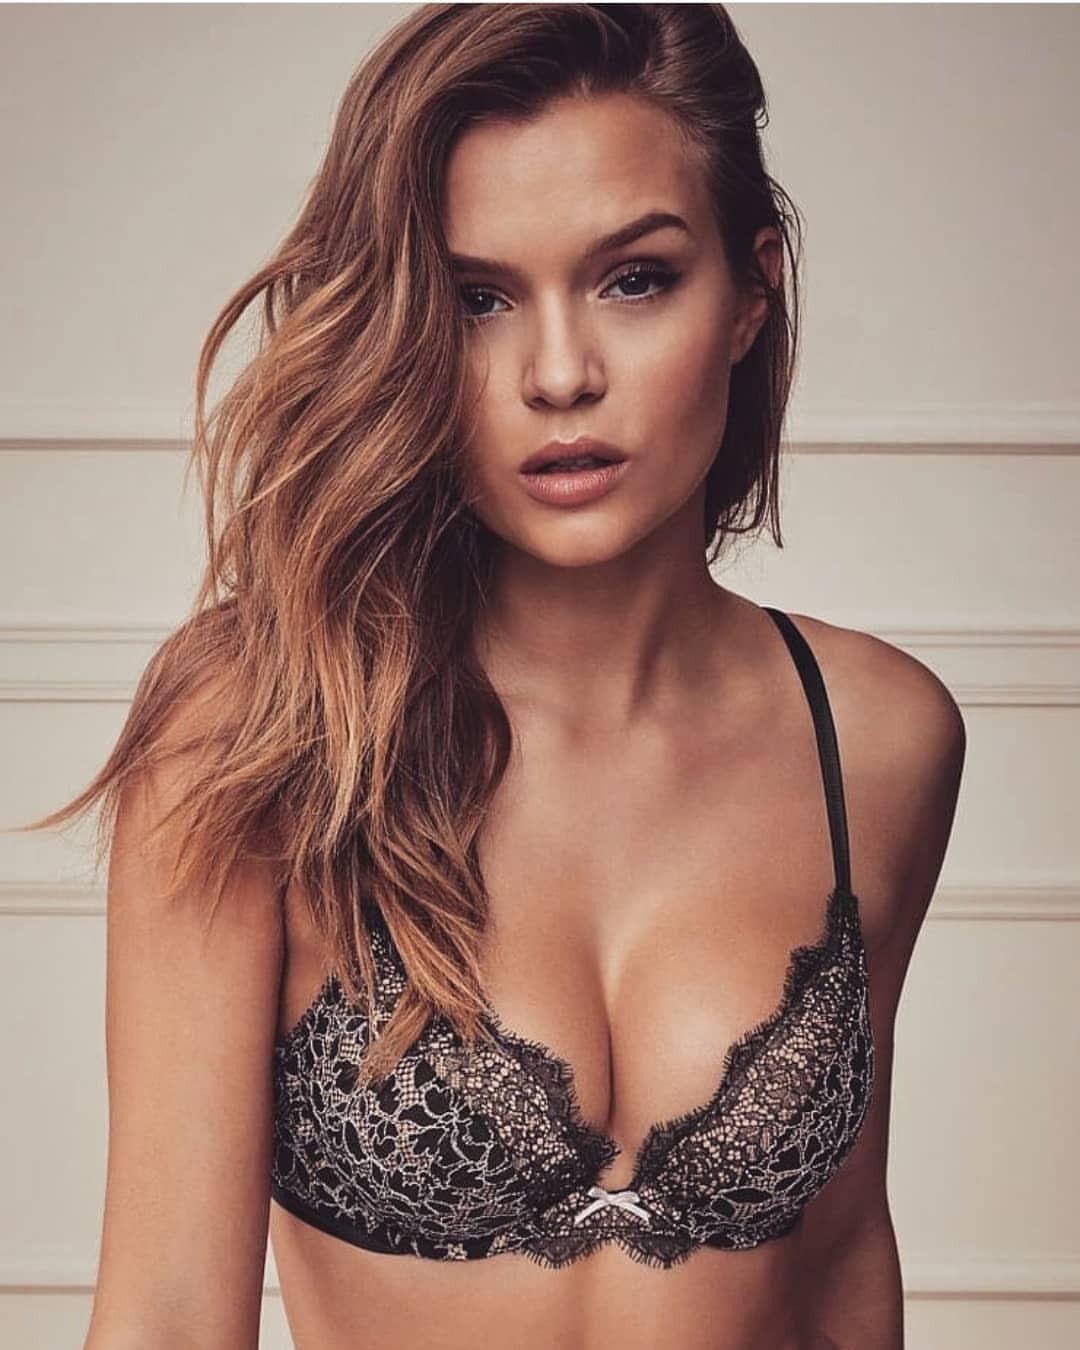 Cleavage Elsa Josephine Skriver nude photos 2019